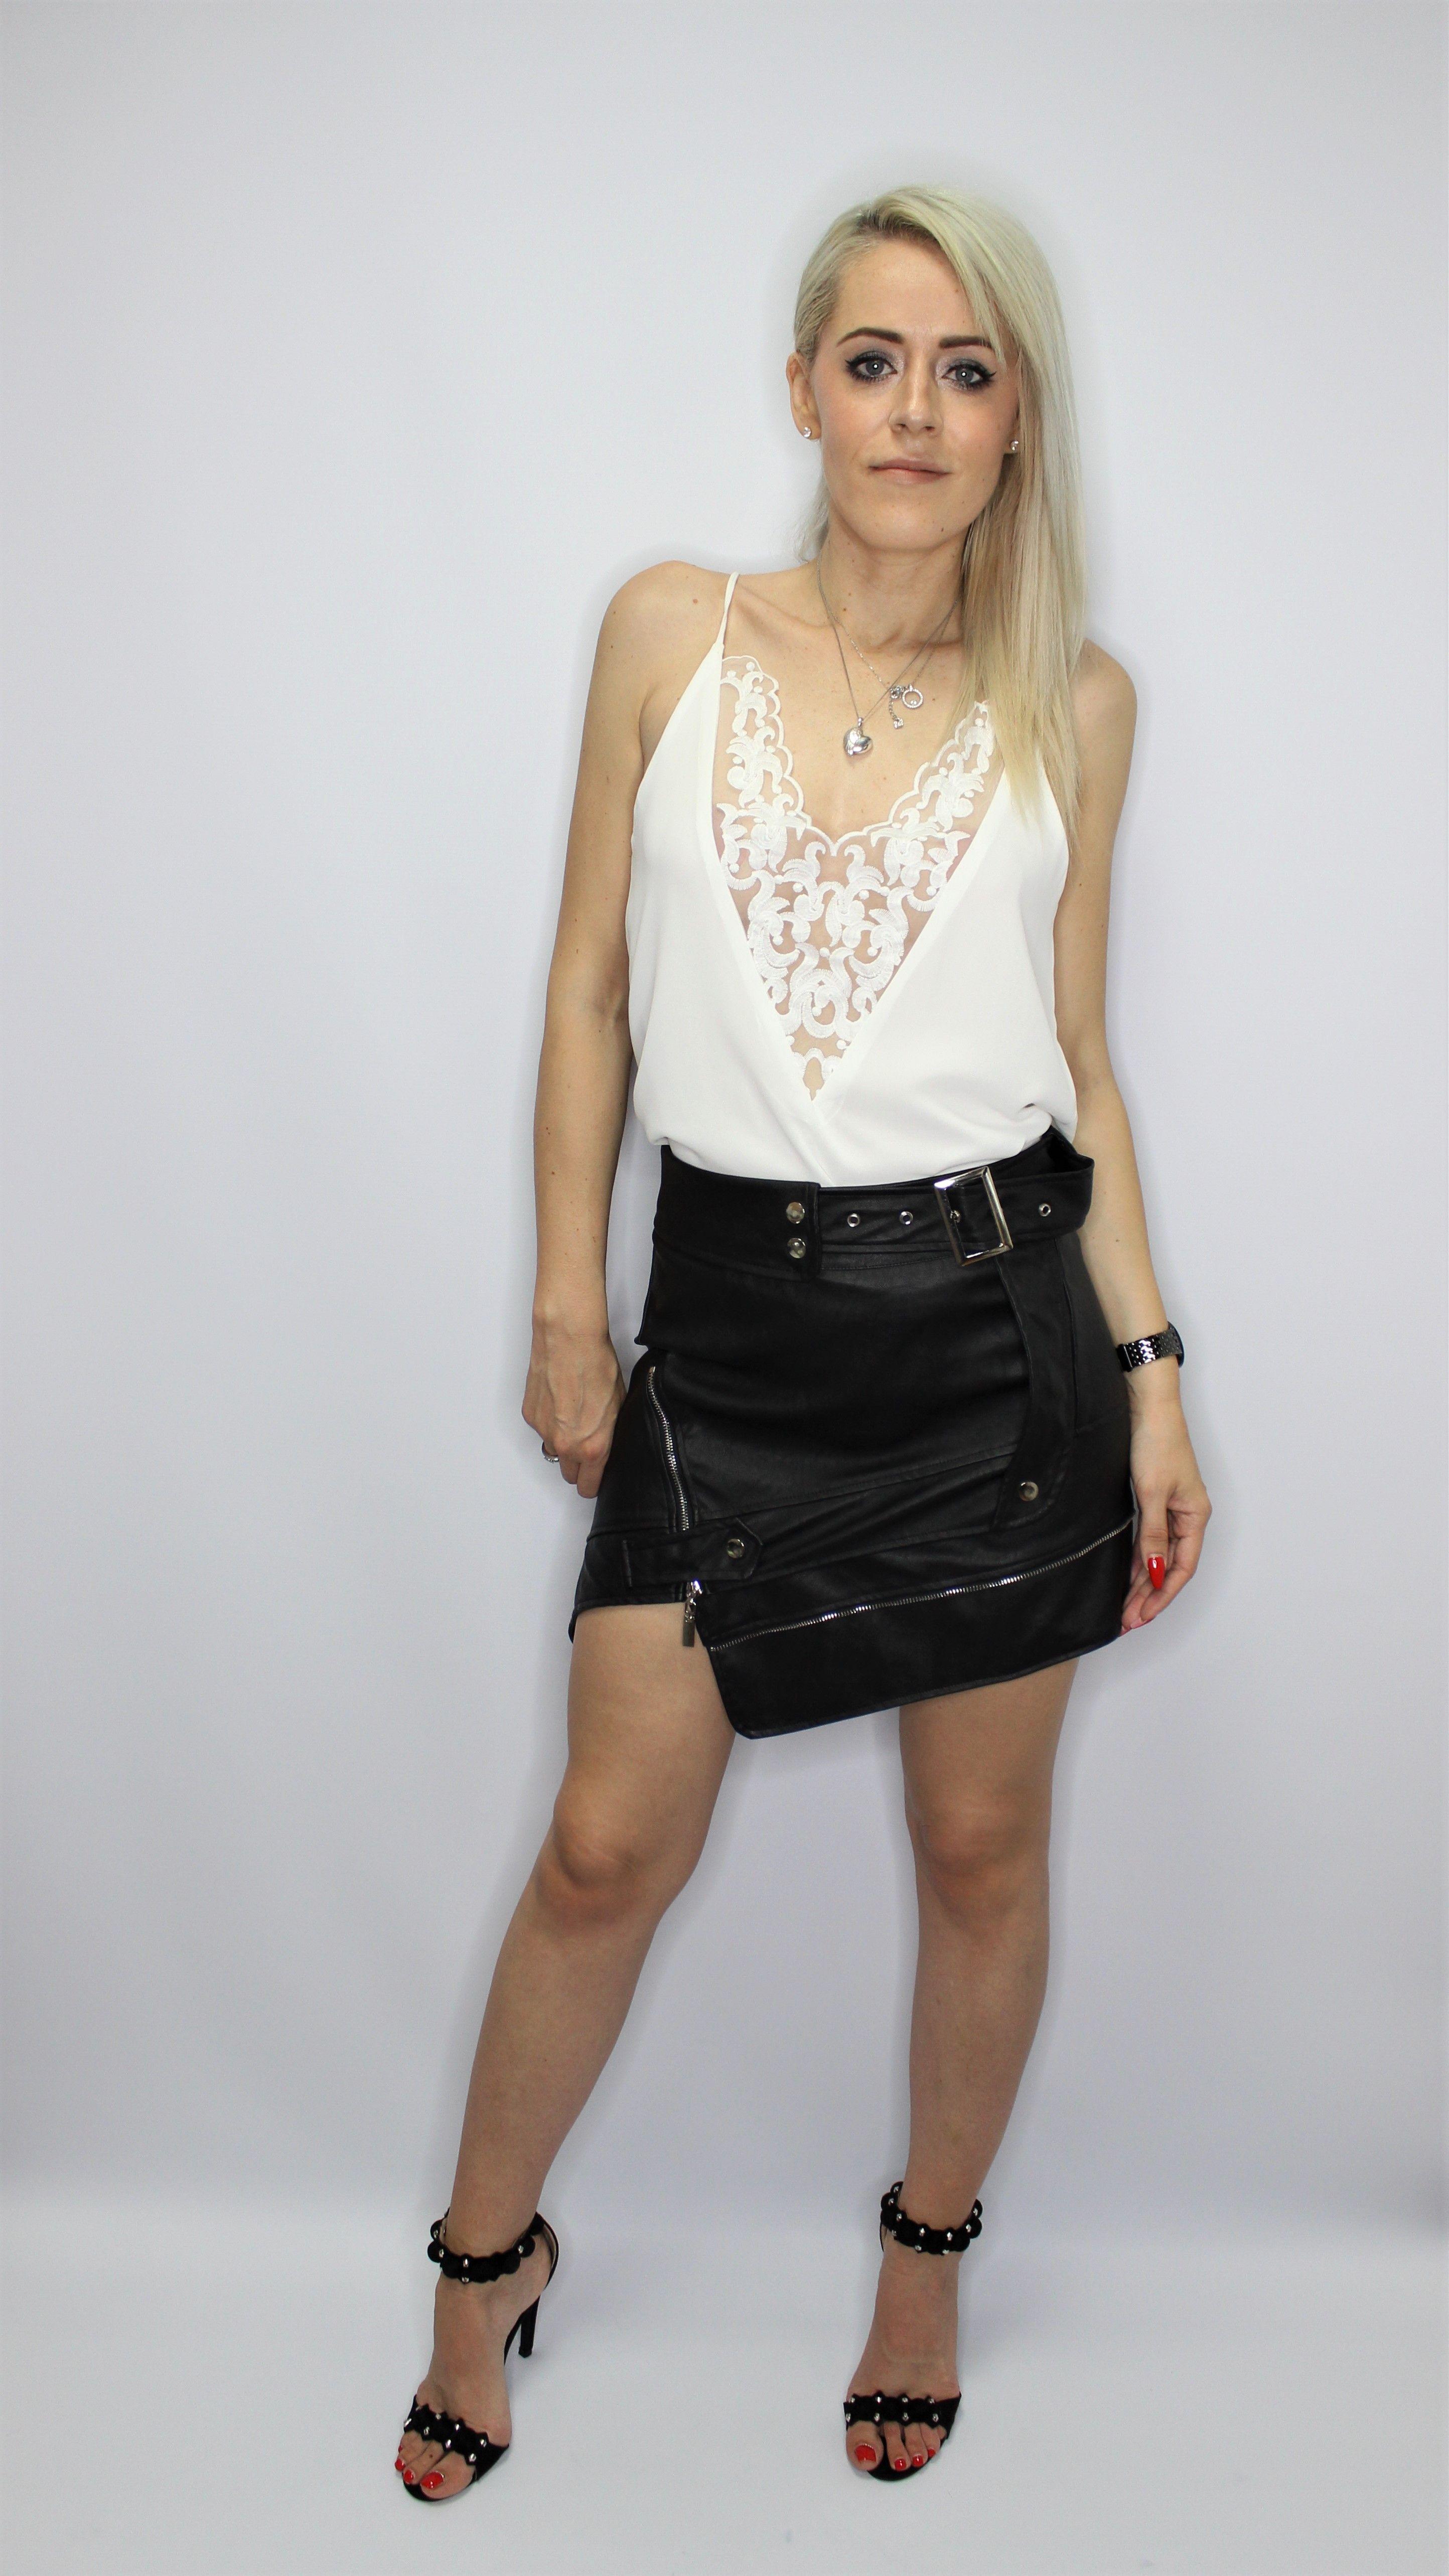 Black Leather Look Biker Mini Skirt